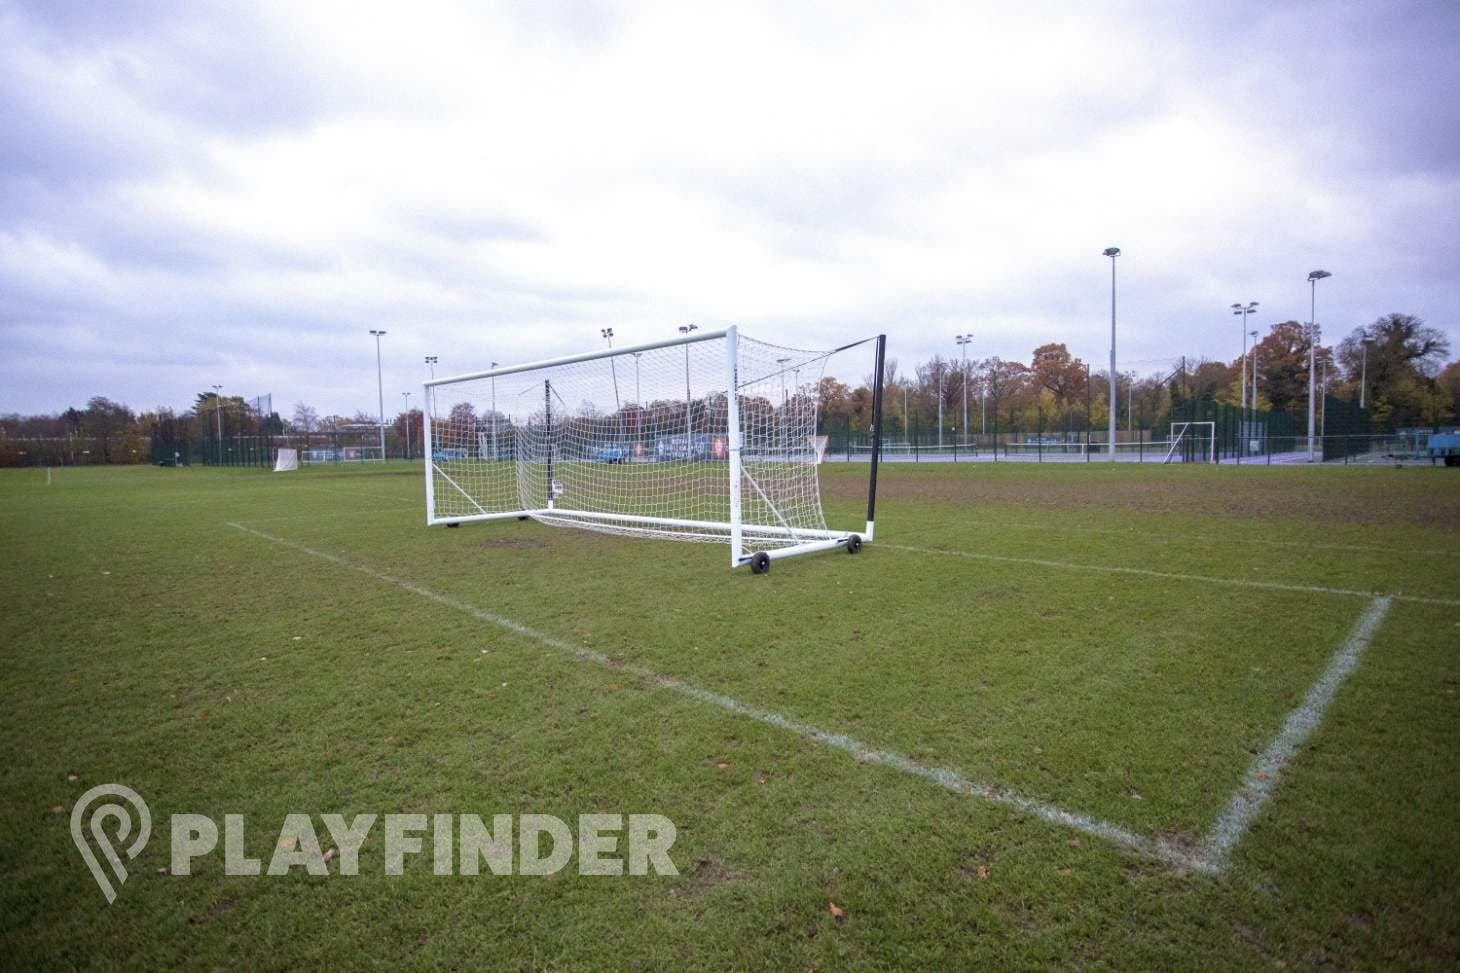 Royal Holloway University Sports Centre 11 a side | Grass football pitch